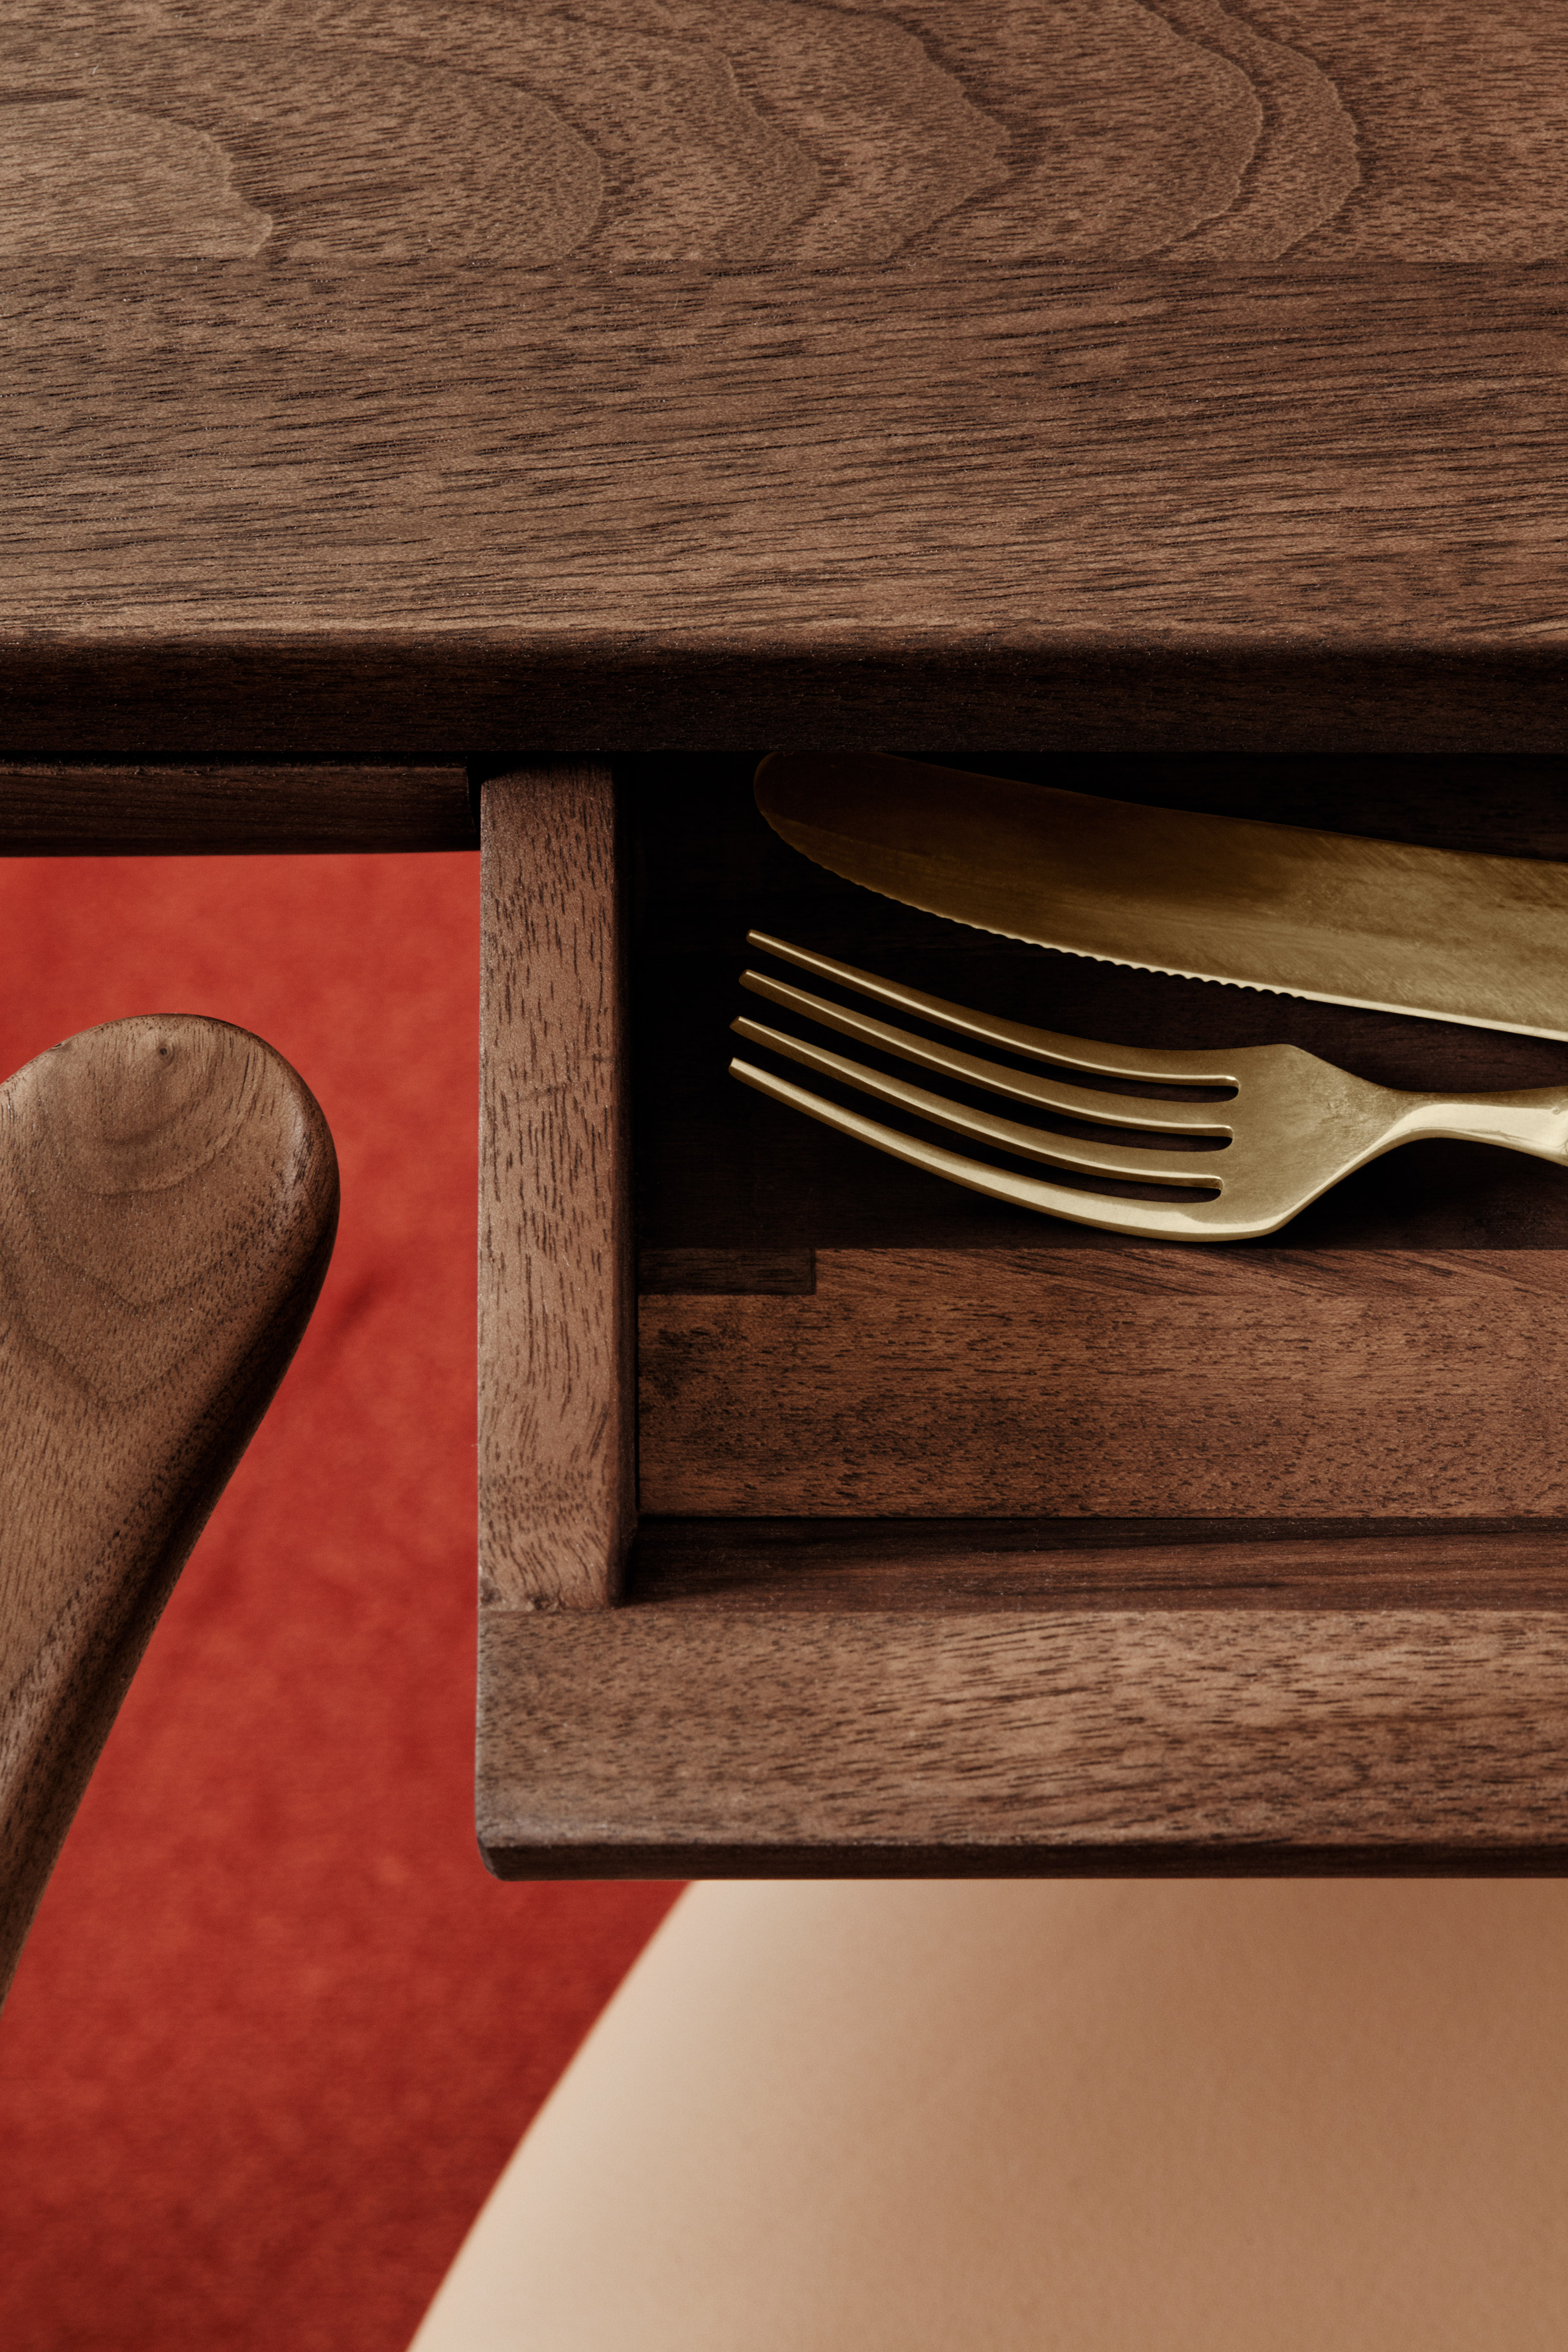 runa-isabel-ahm-aarm-nordic-design-furniture-danish_dezeen_2364_col_18.jpg